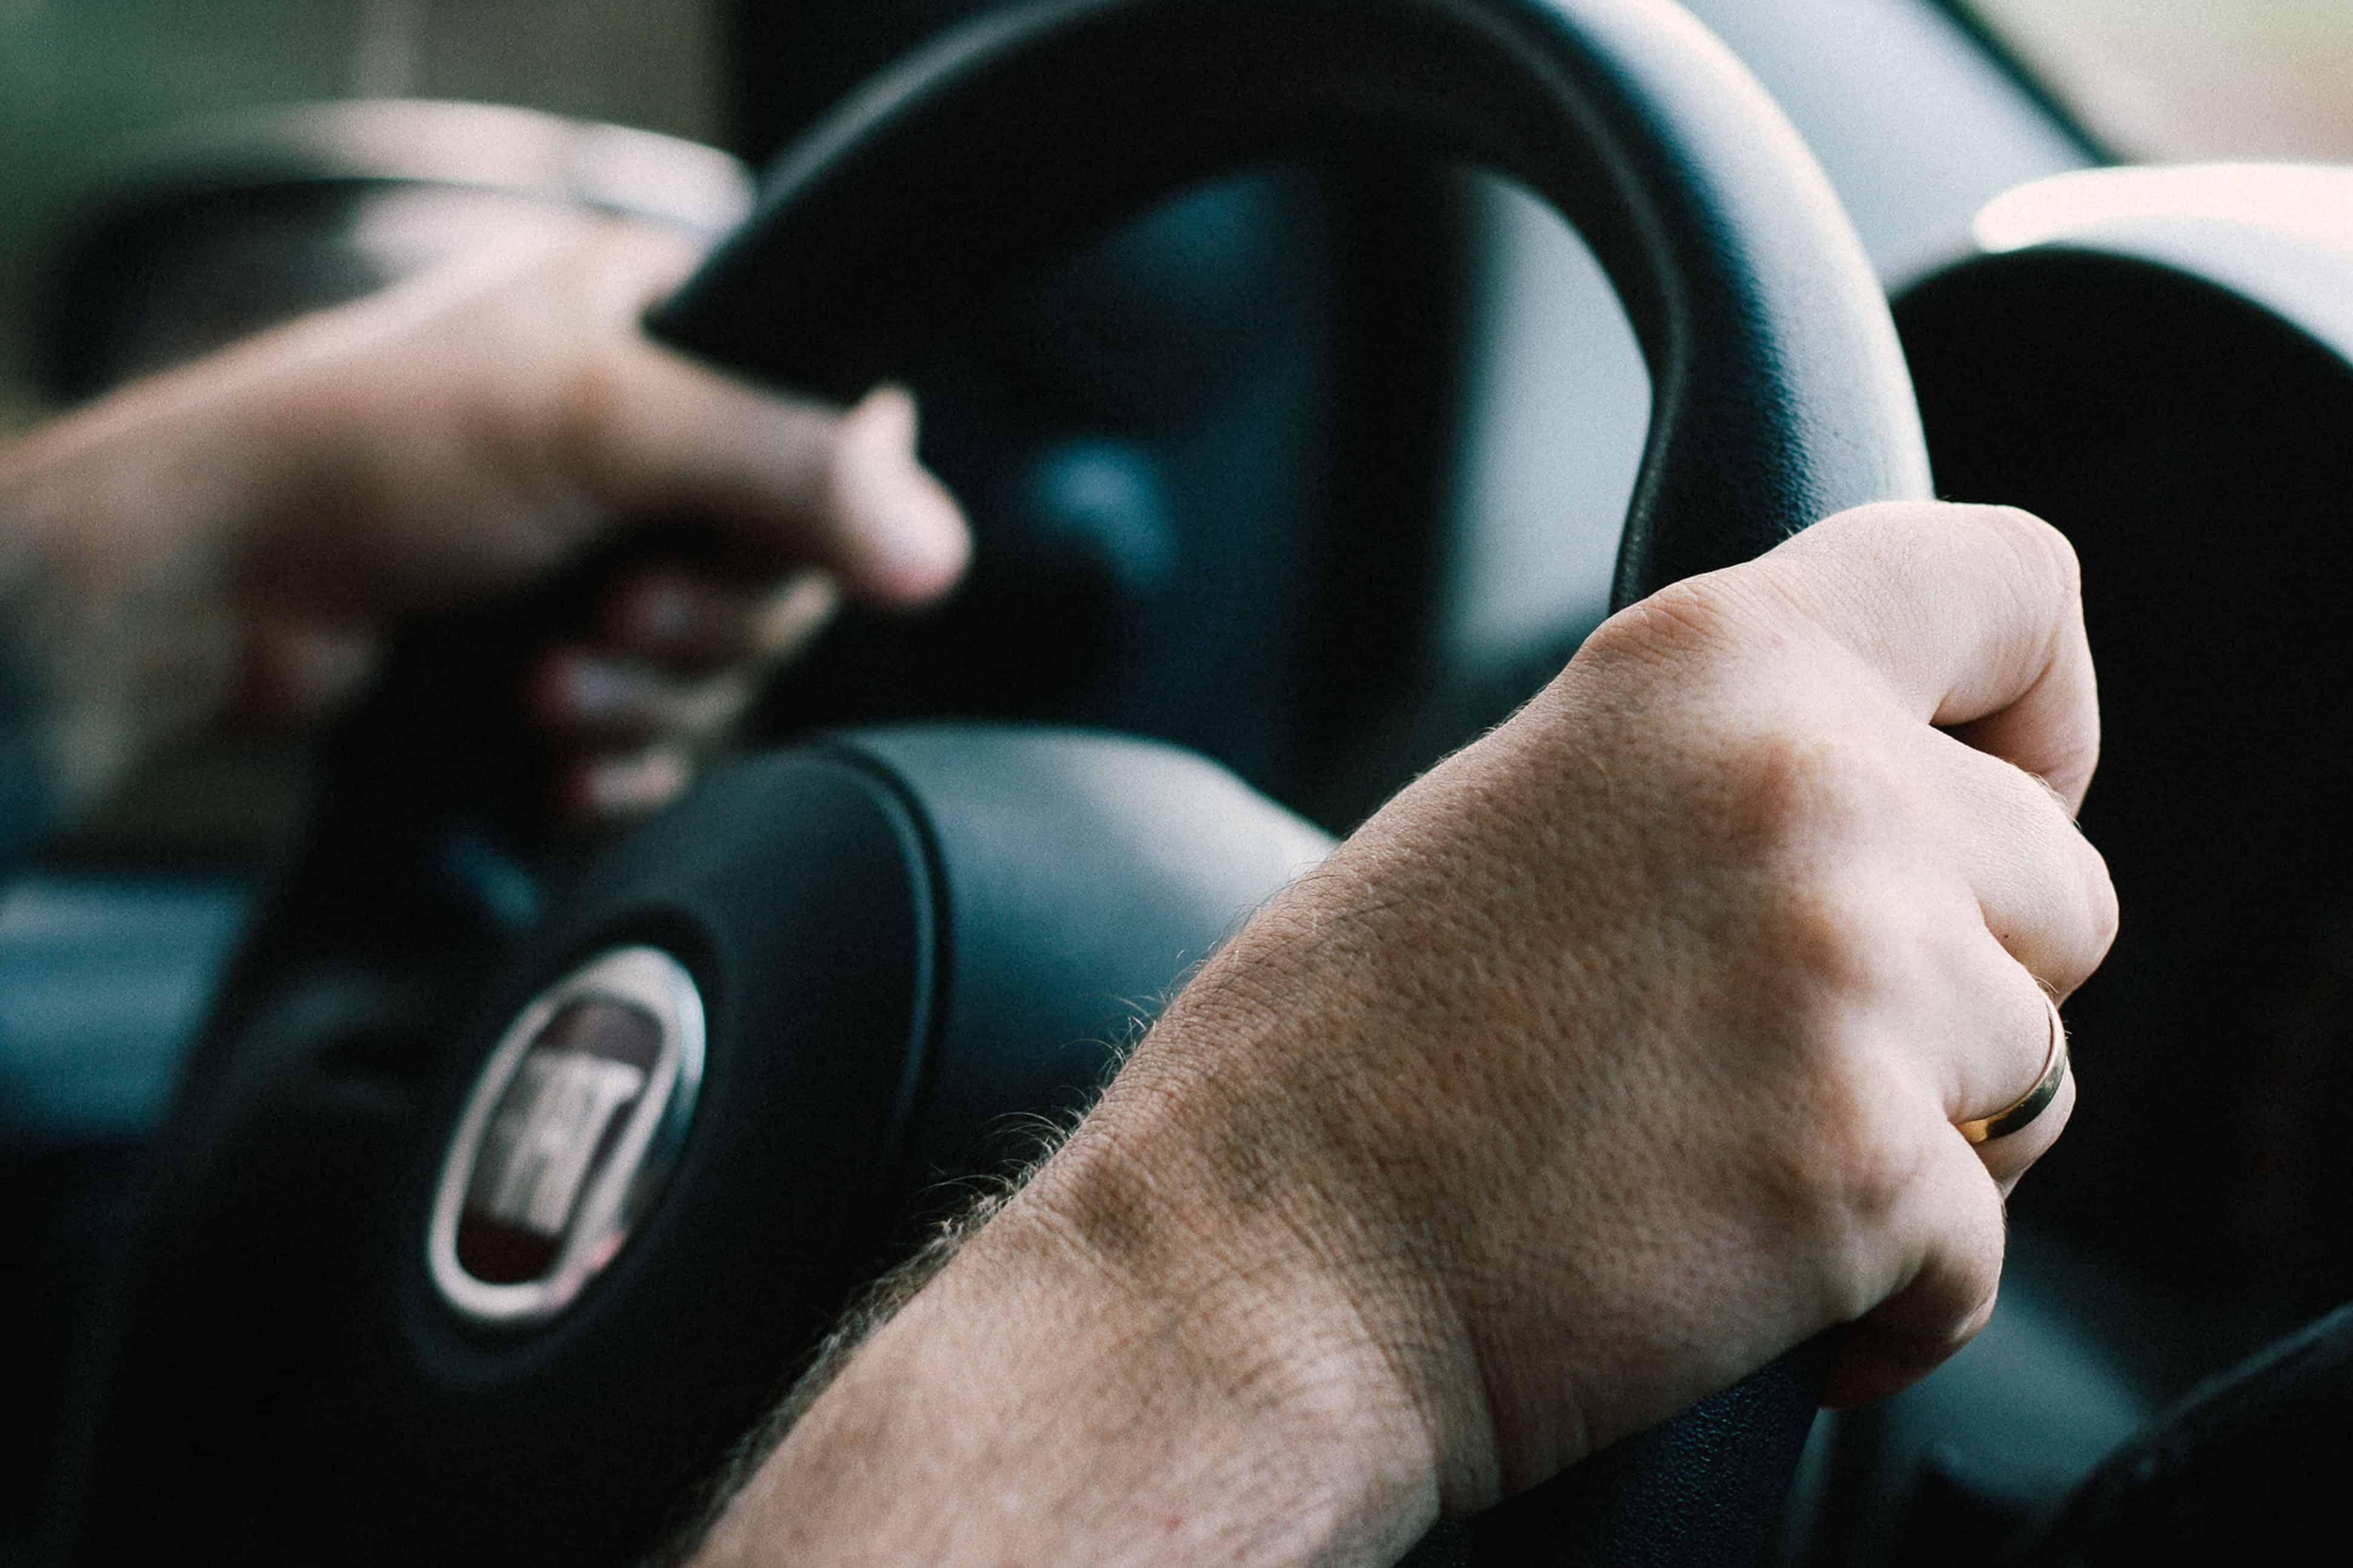 1 Person Dead in DUI Crash on Highway 108 near Koinonia Court [Tuolumne County, CA]